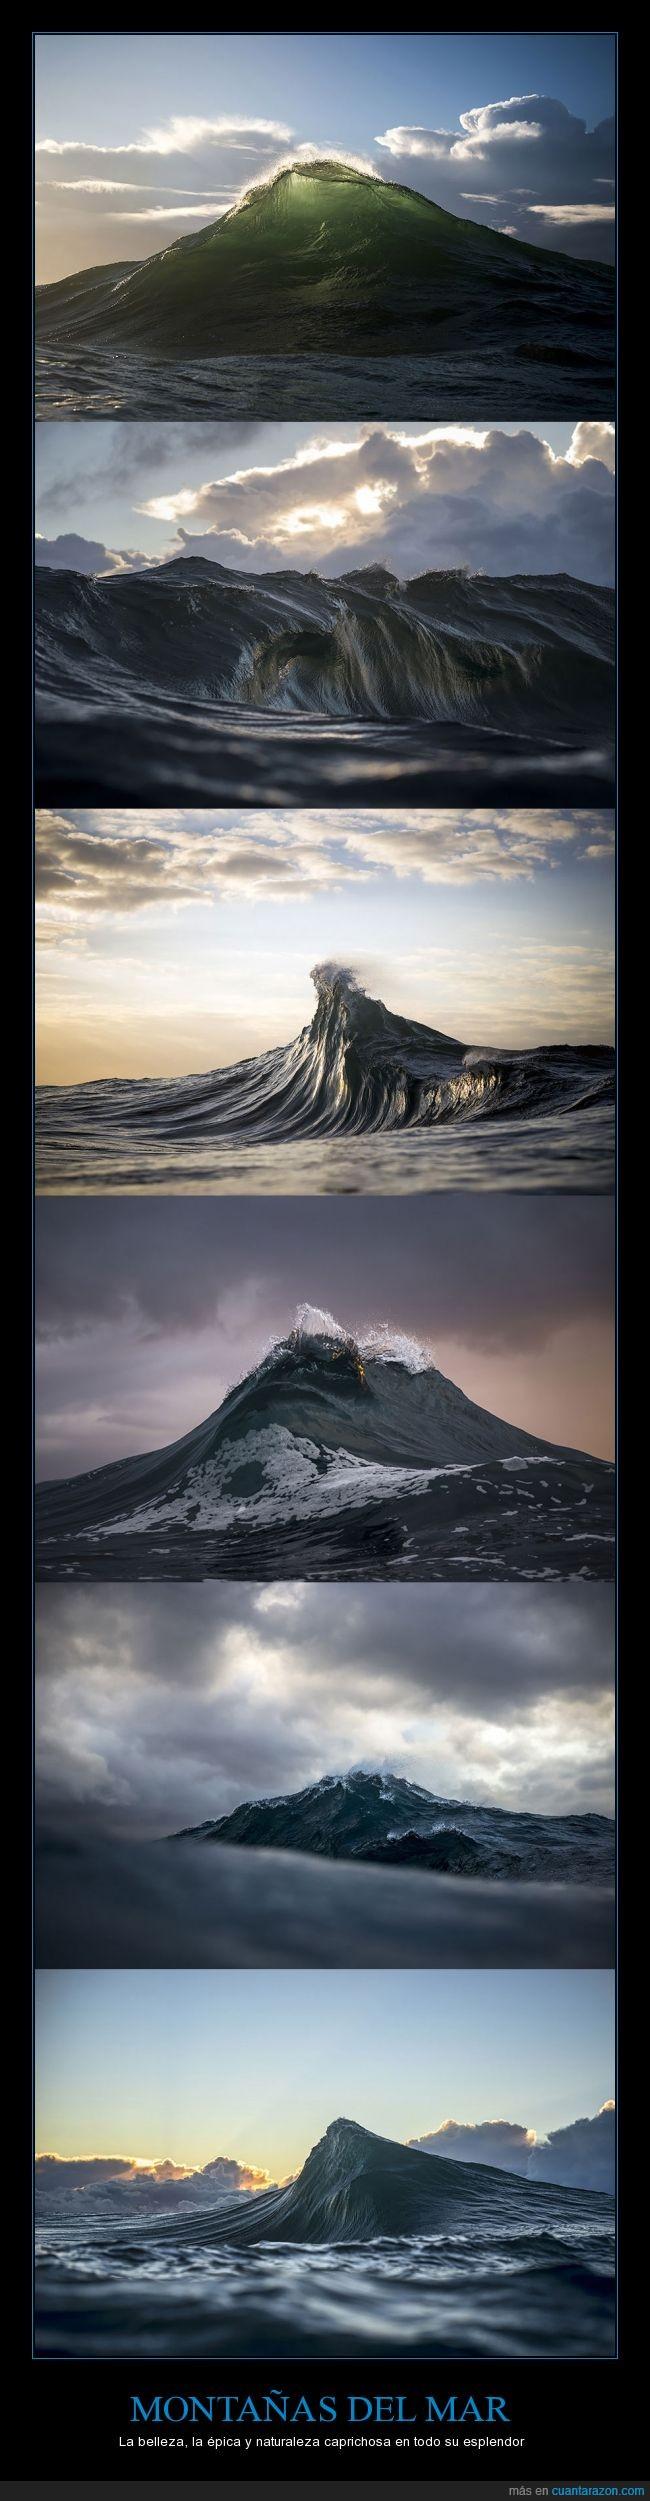 Fotografía,mar,montañas,naturaleza,olas,Ray Collins